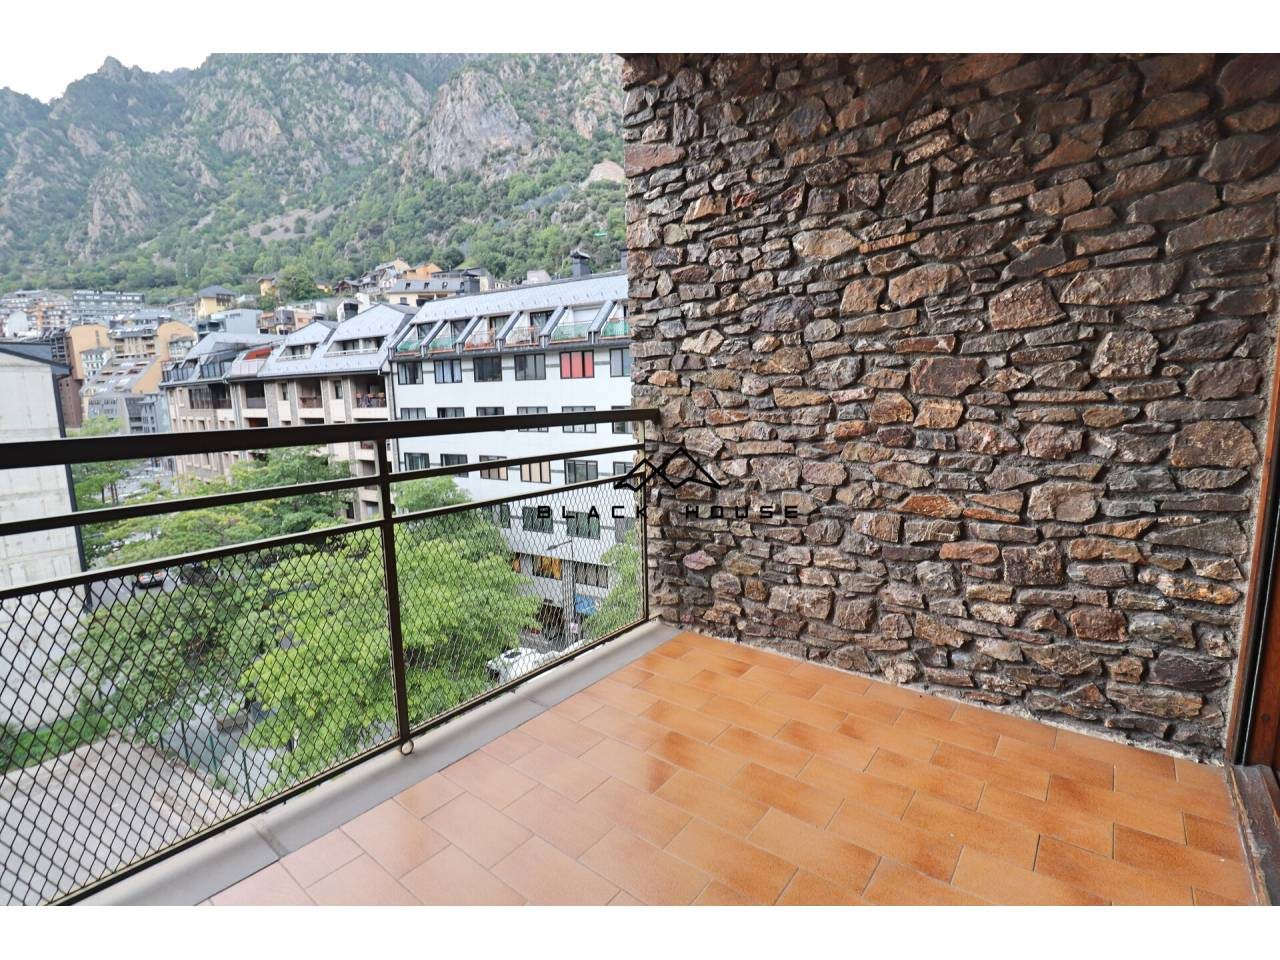 Fabulós pis en venda en avinguda comercial d'Andorra la Vella